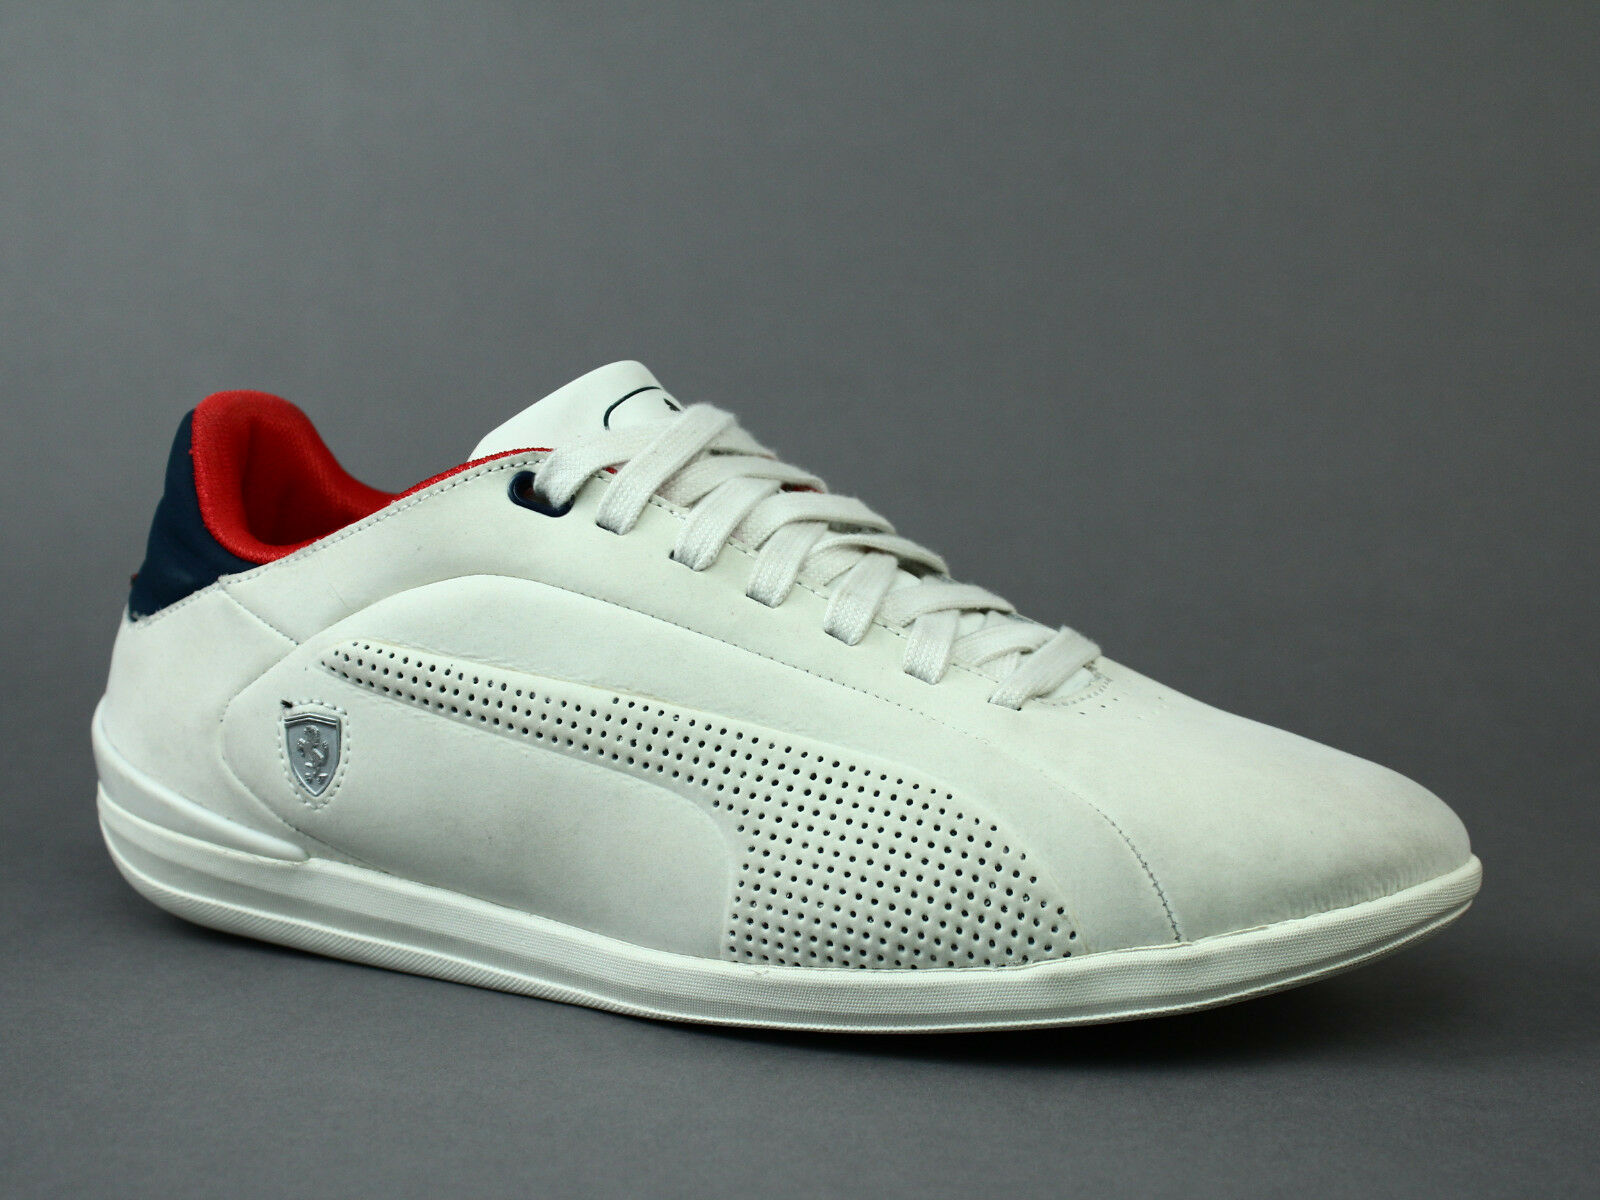 Puma Gigante Uomo LO SF Ferrari  Uomo Gigante  Fashion Casual  Leder Schuhes Sneakers 84c099